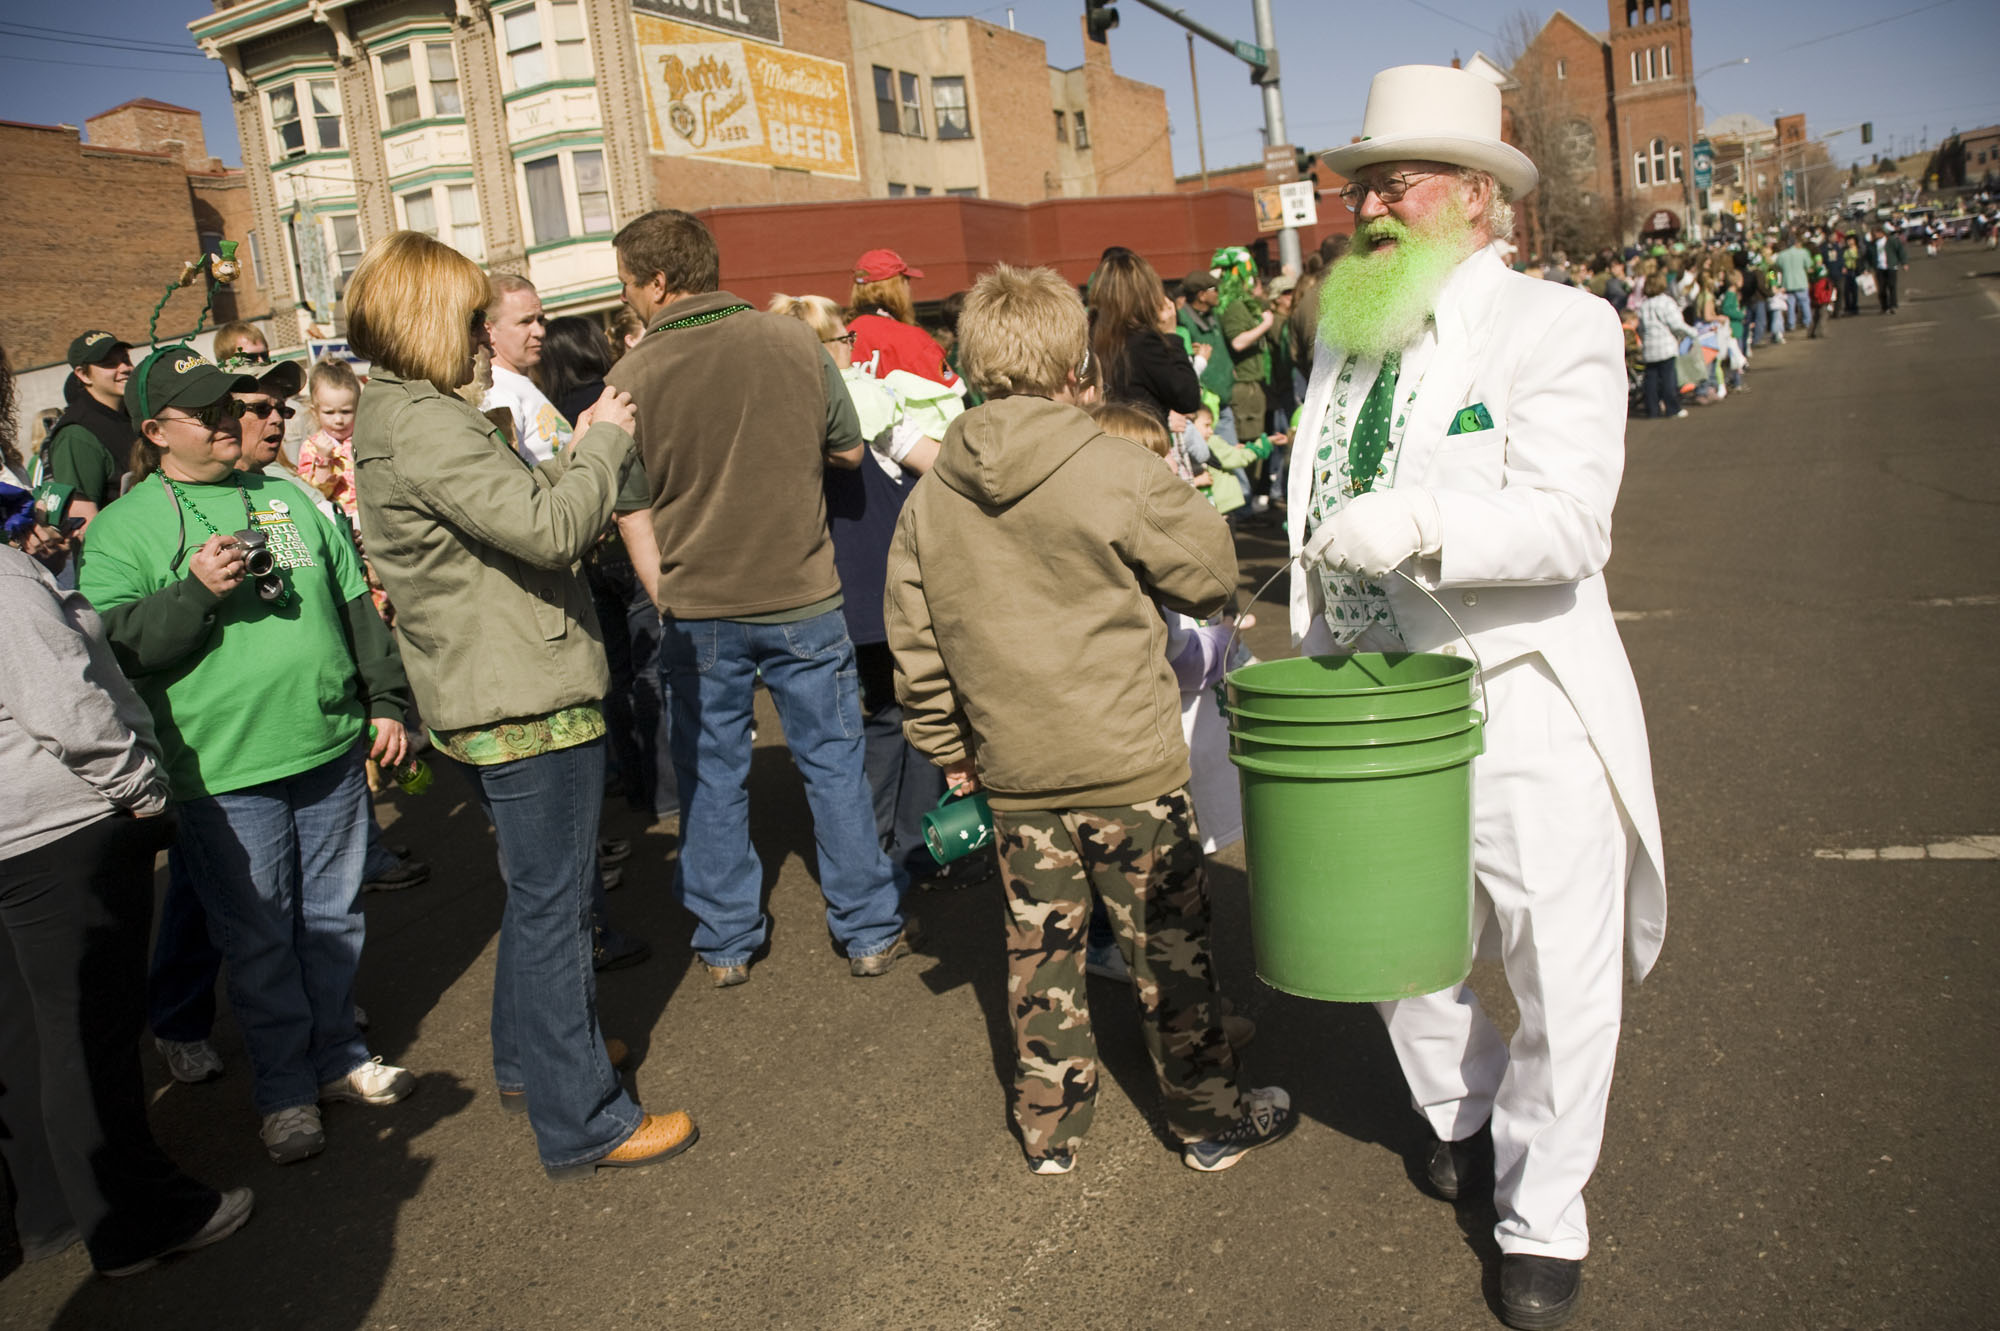 Butte St. Patrick's Day 2010